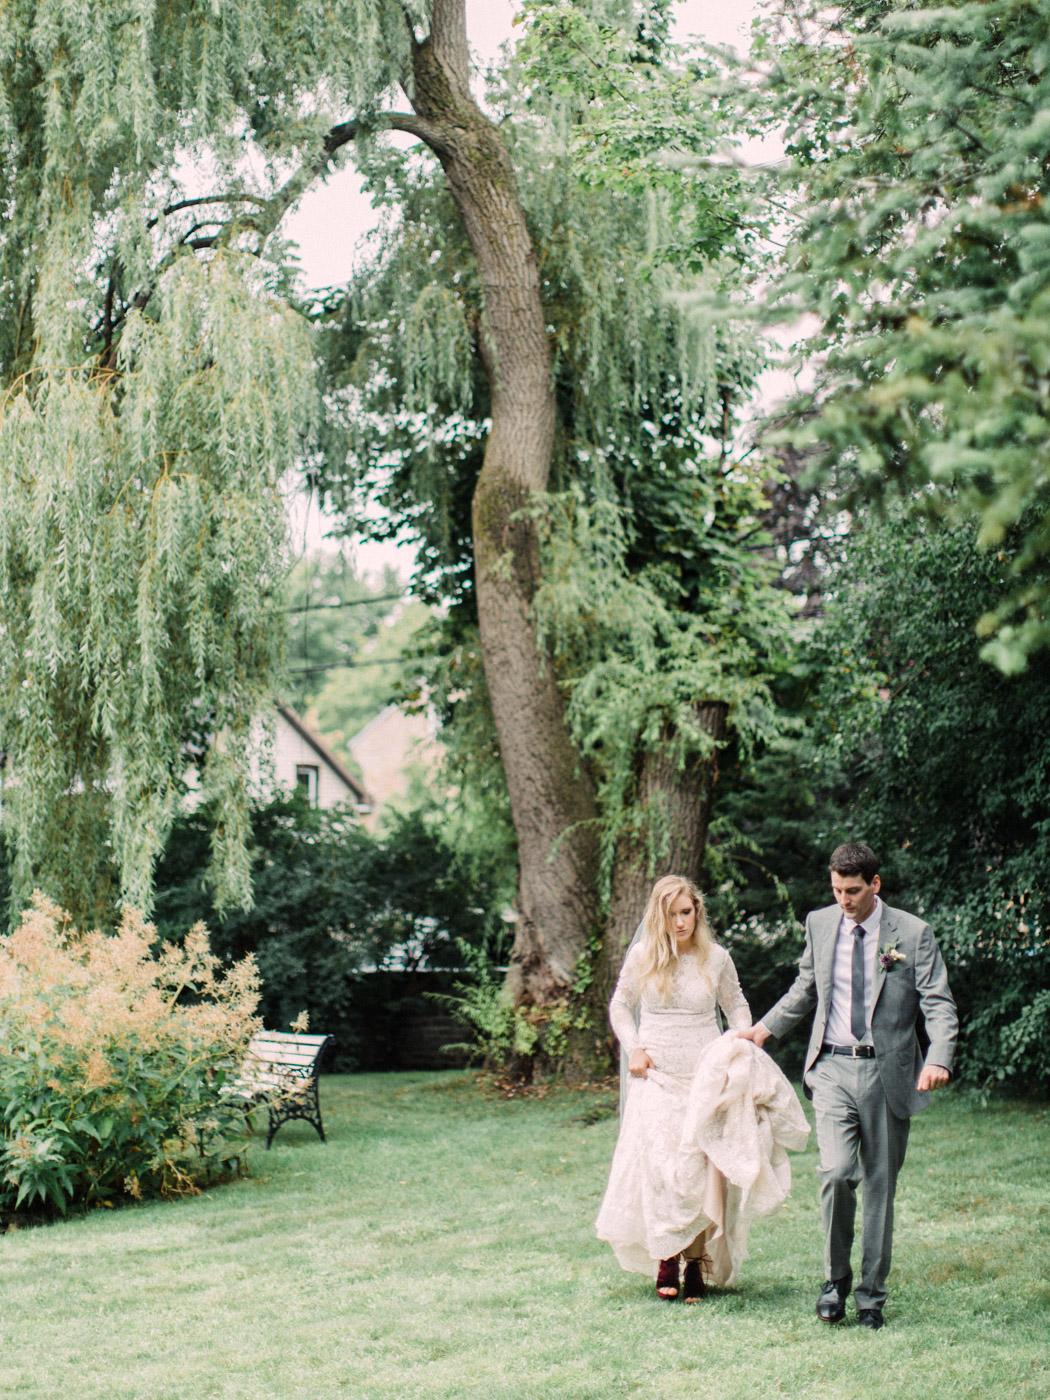 Toronto-wedding-photographer-intimate-classic-fine-art-elopement-ottawa67.jpg